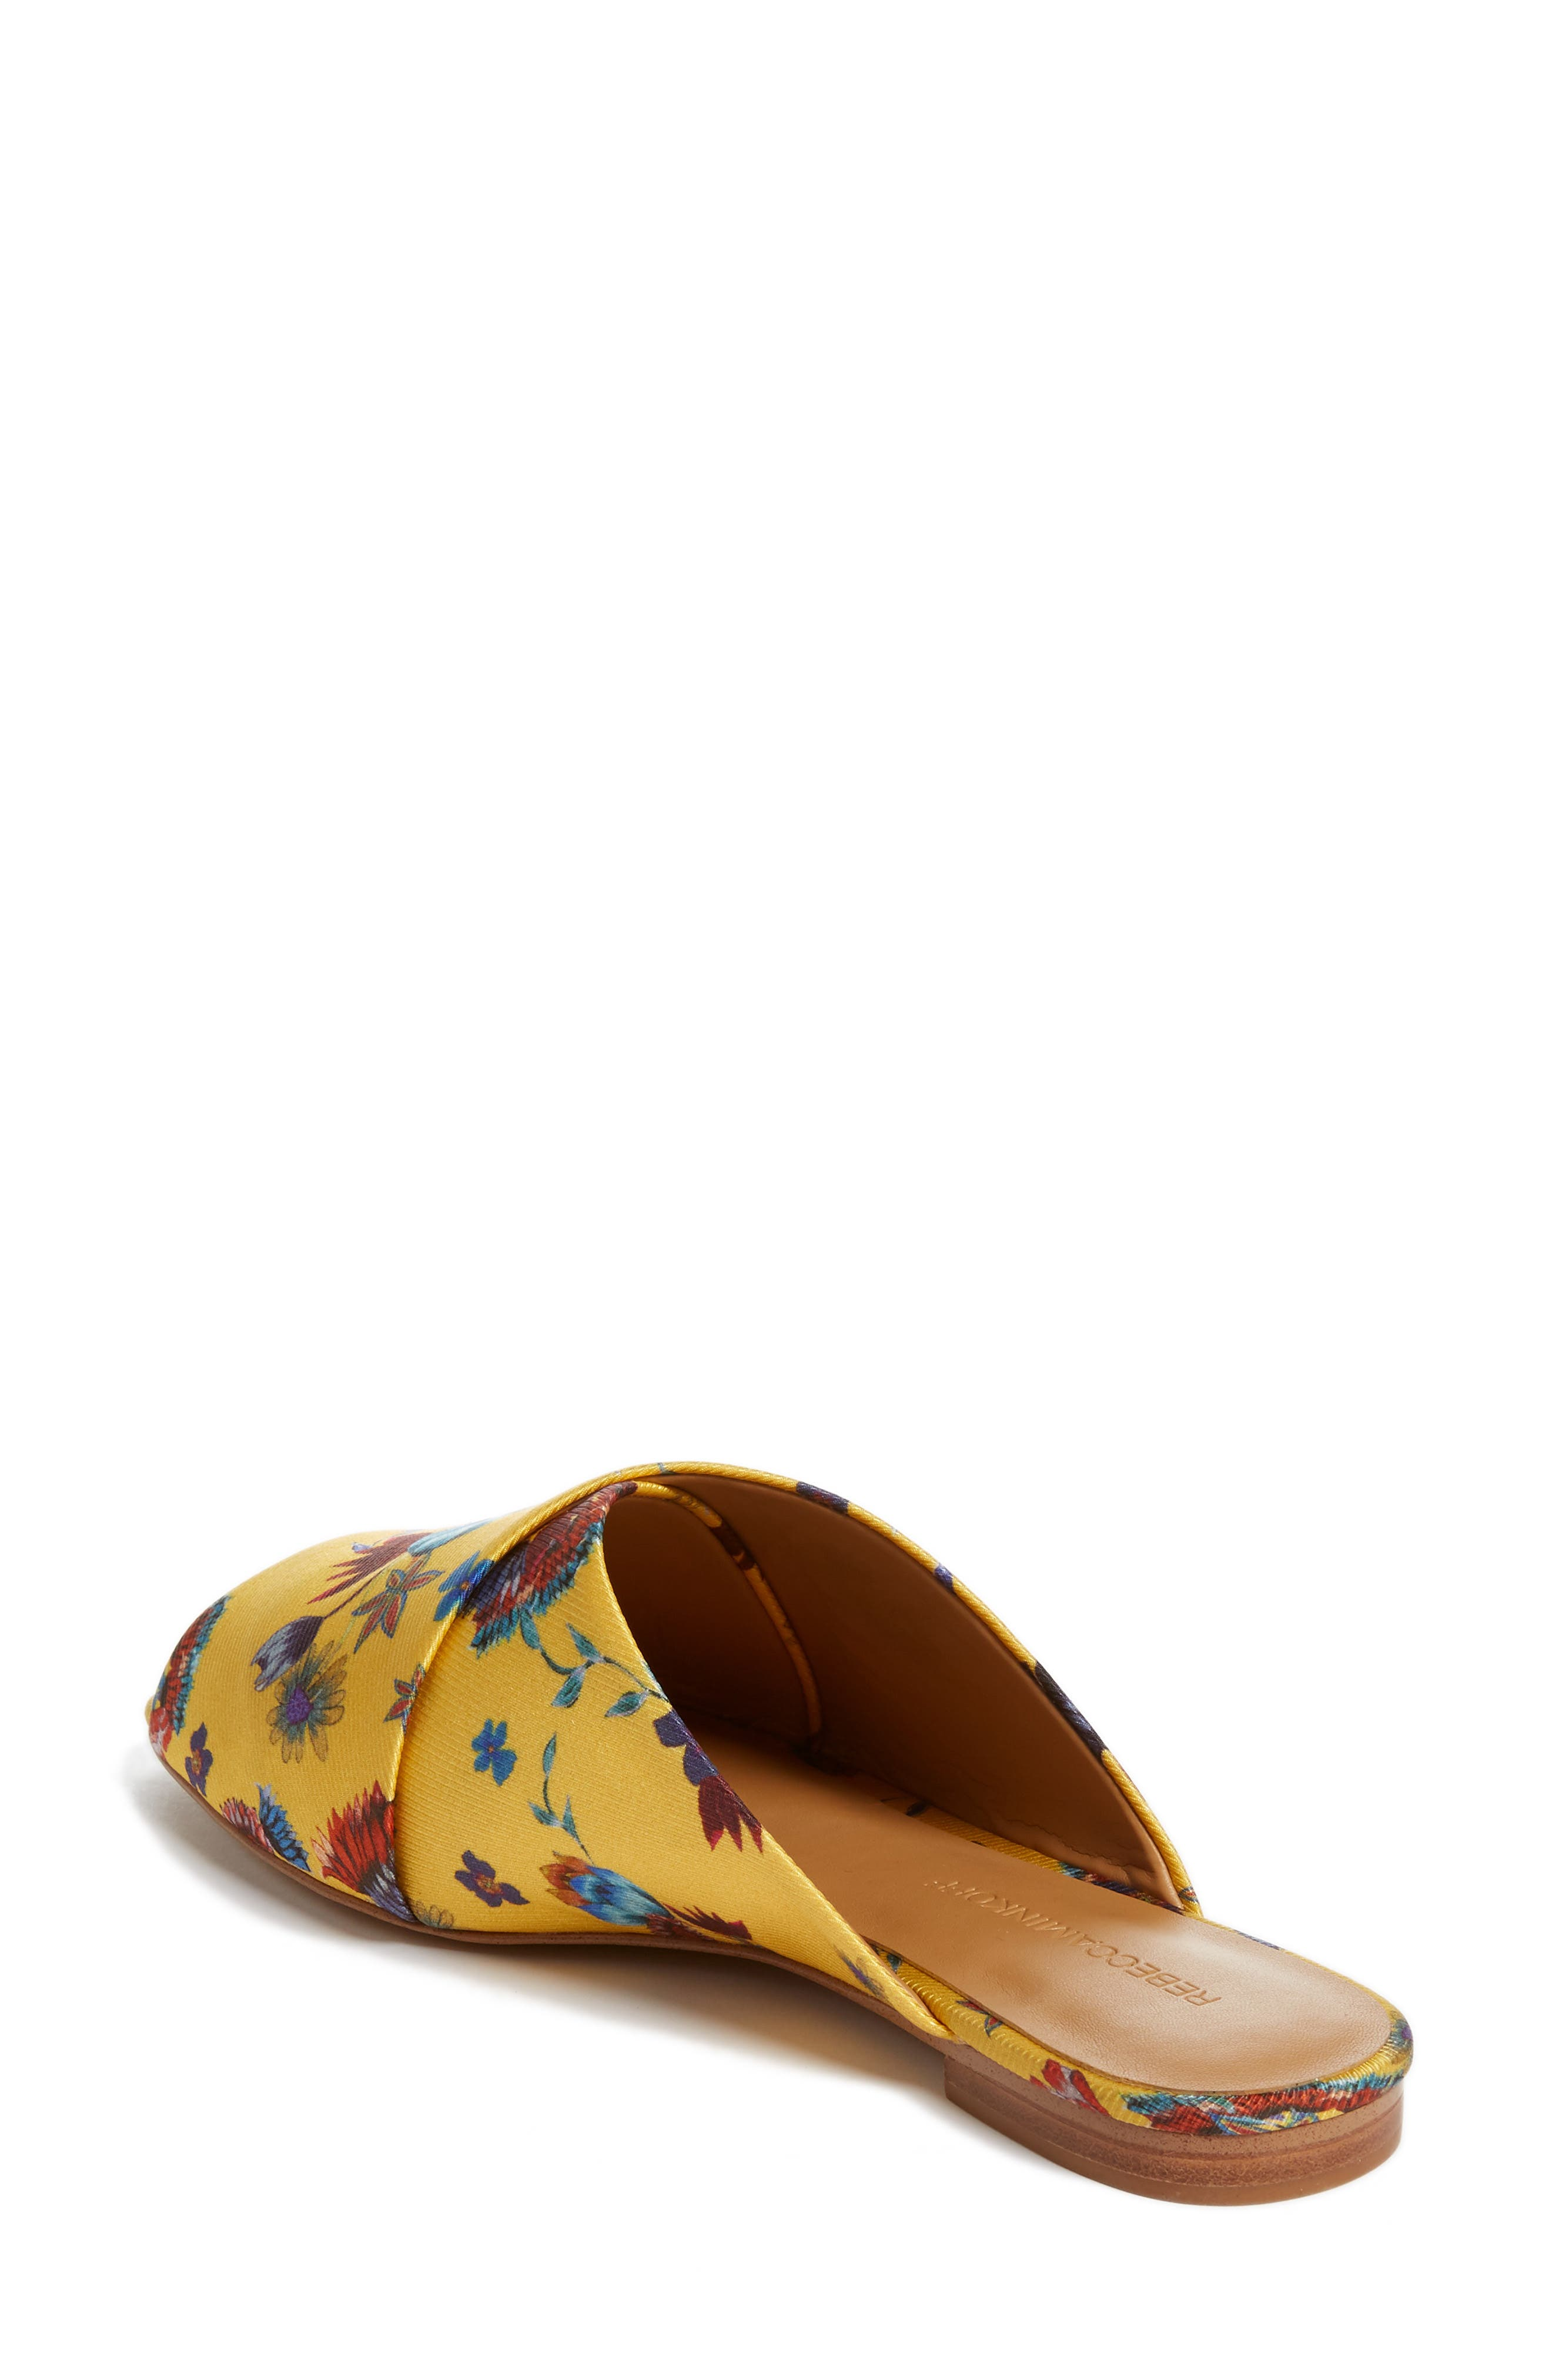 Anden Slide Sandal,                             Alternate thumbnail 2, color,                             Butterscotch Multi Print Silk